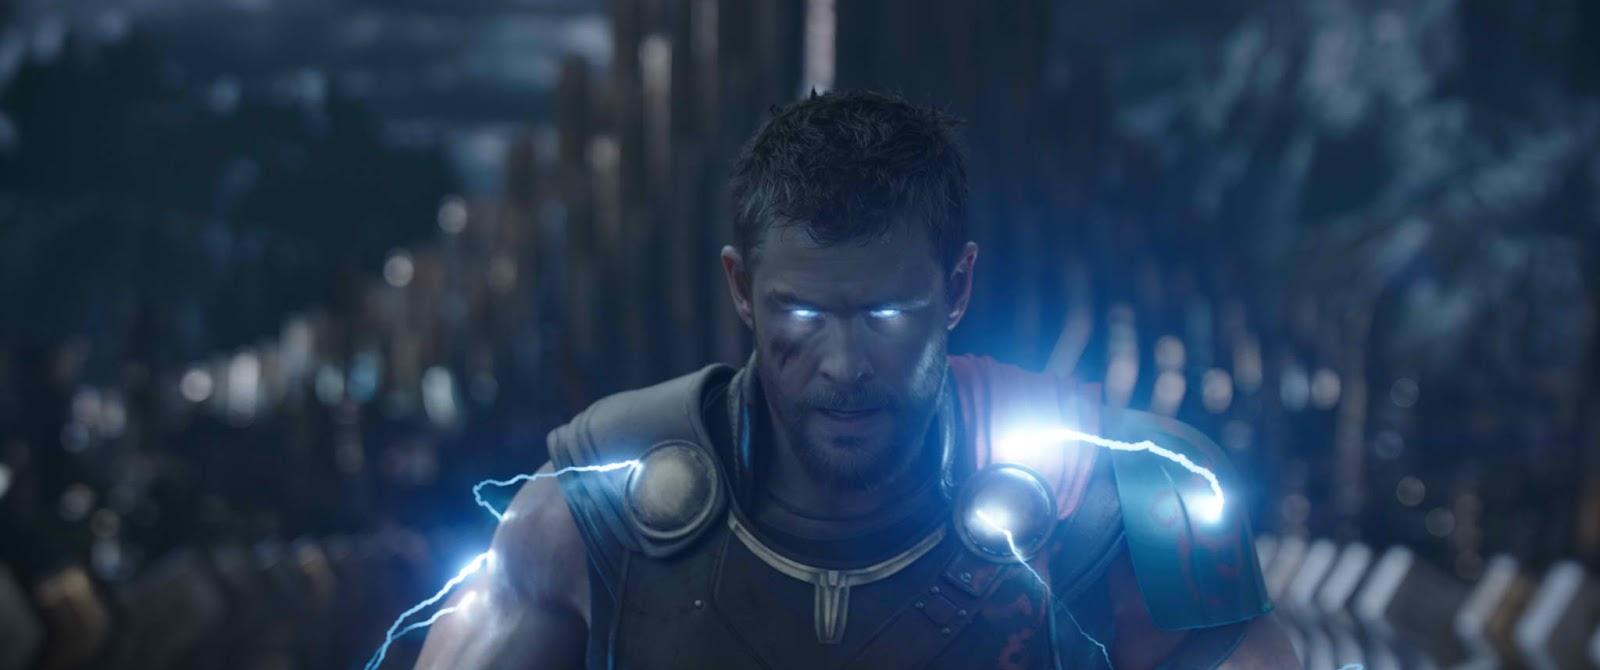 Thor: Ragnarok: Movie Review